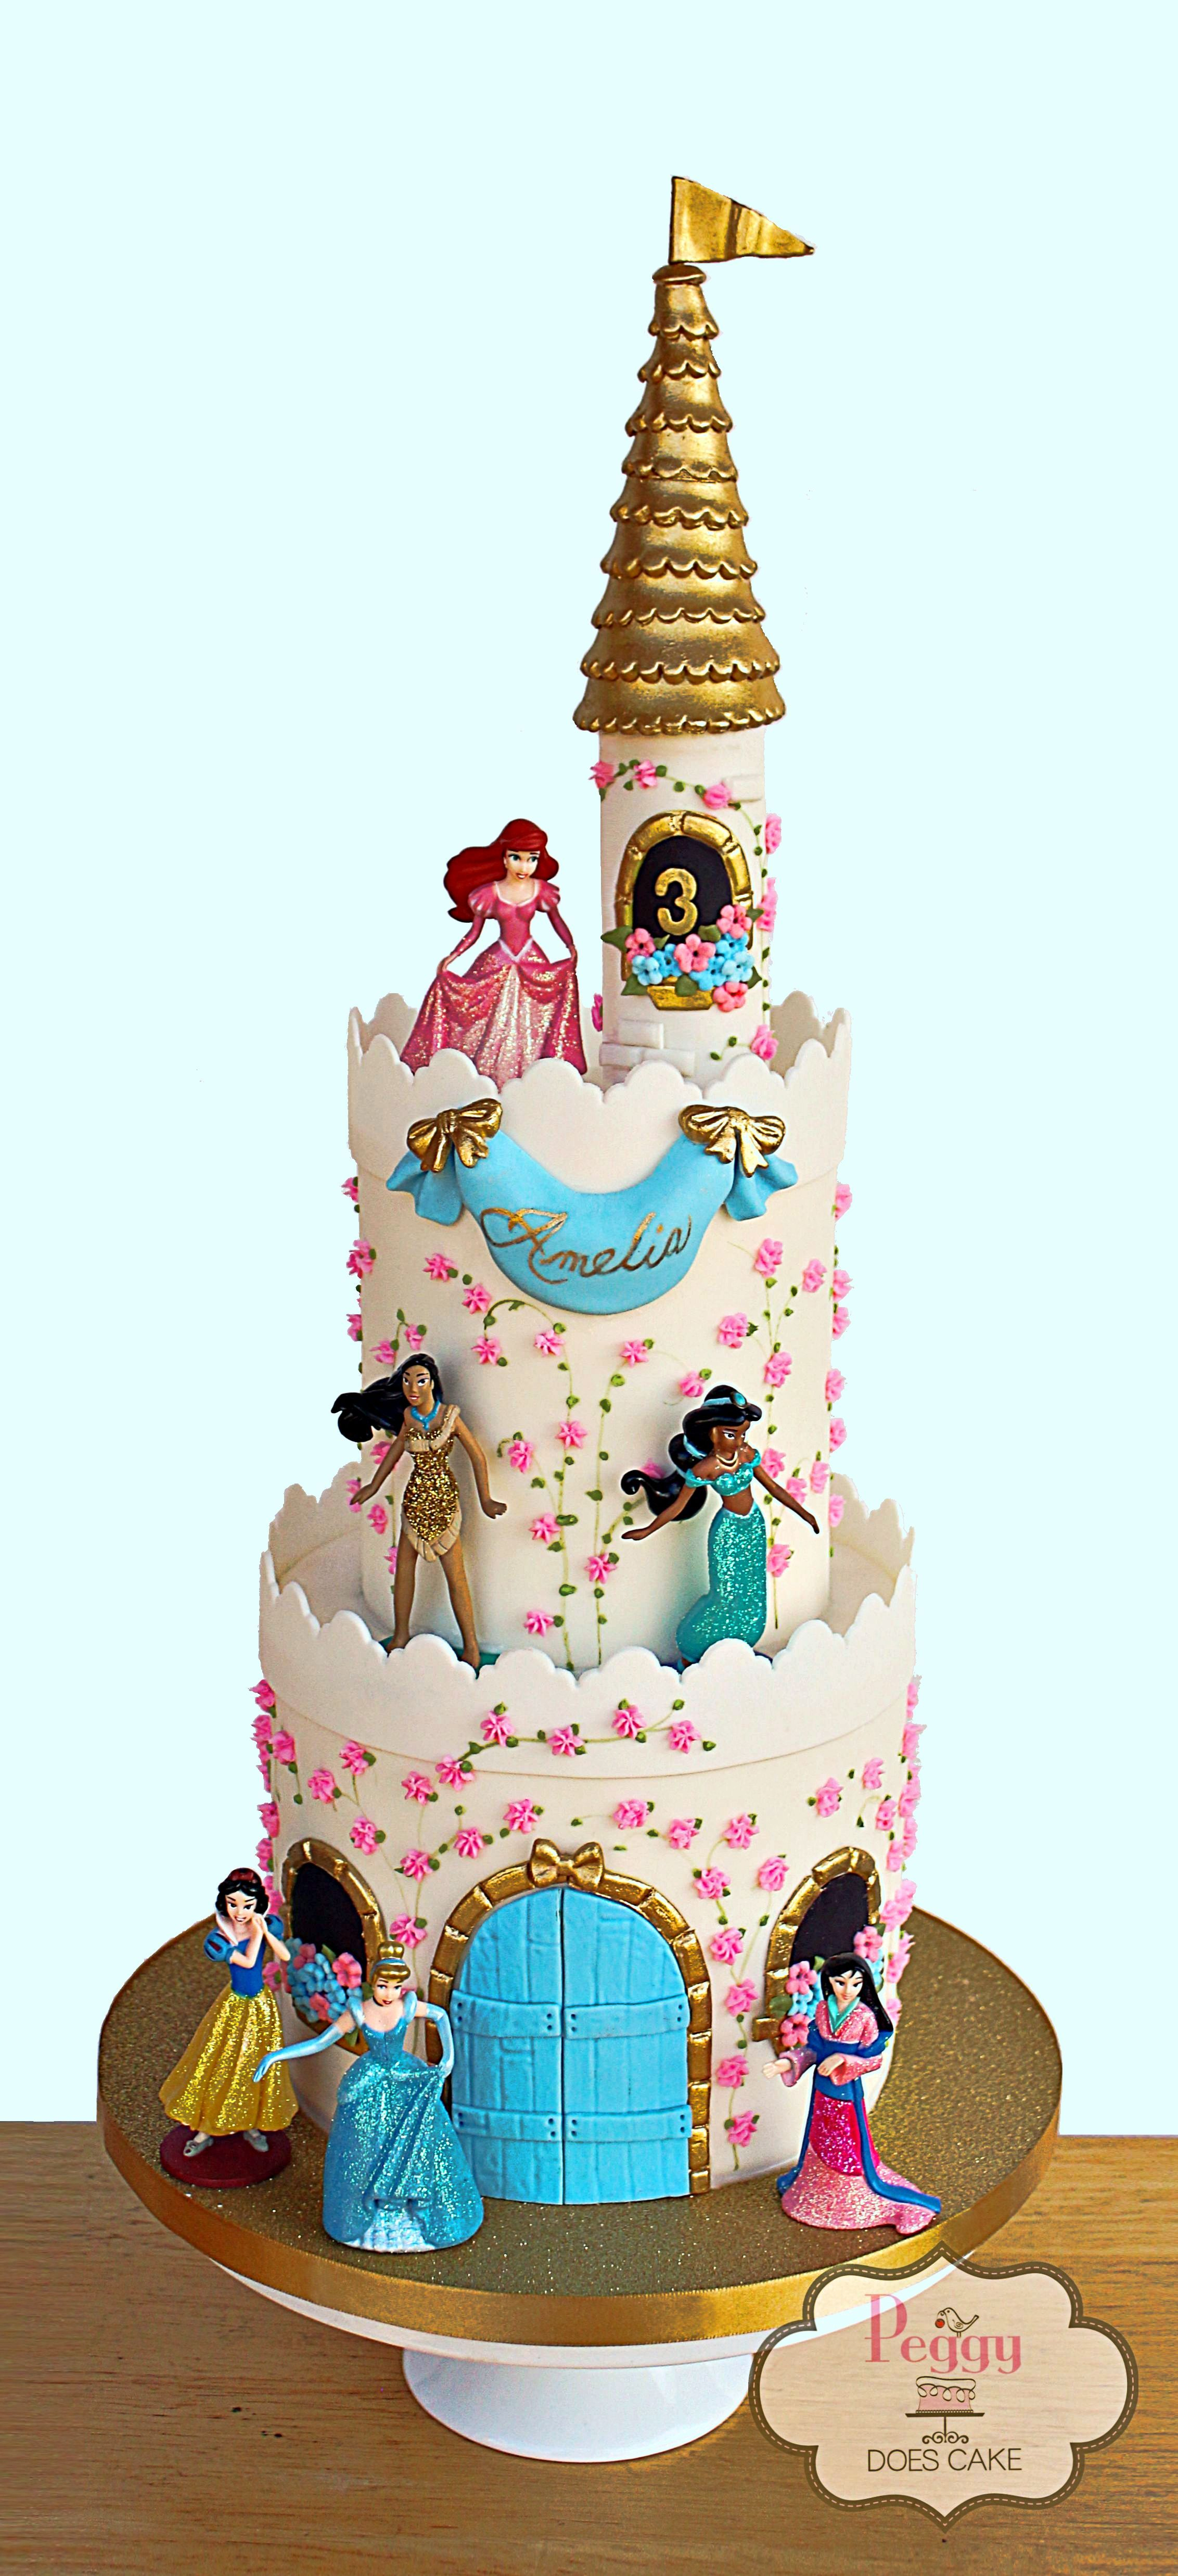 Idea by Elizabeth Smith on Decorating Inspiration Cakes